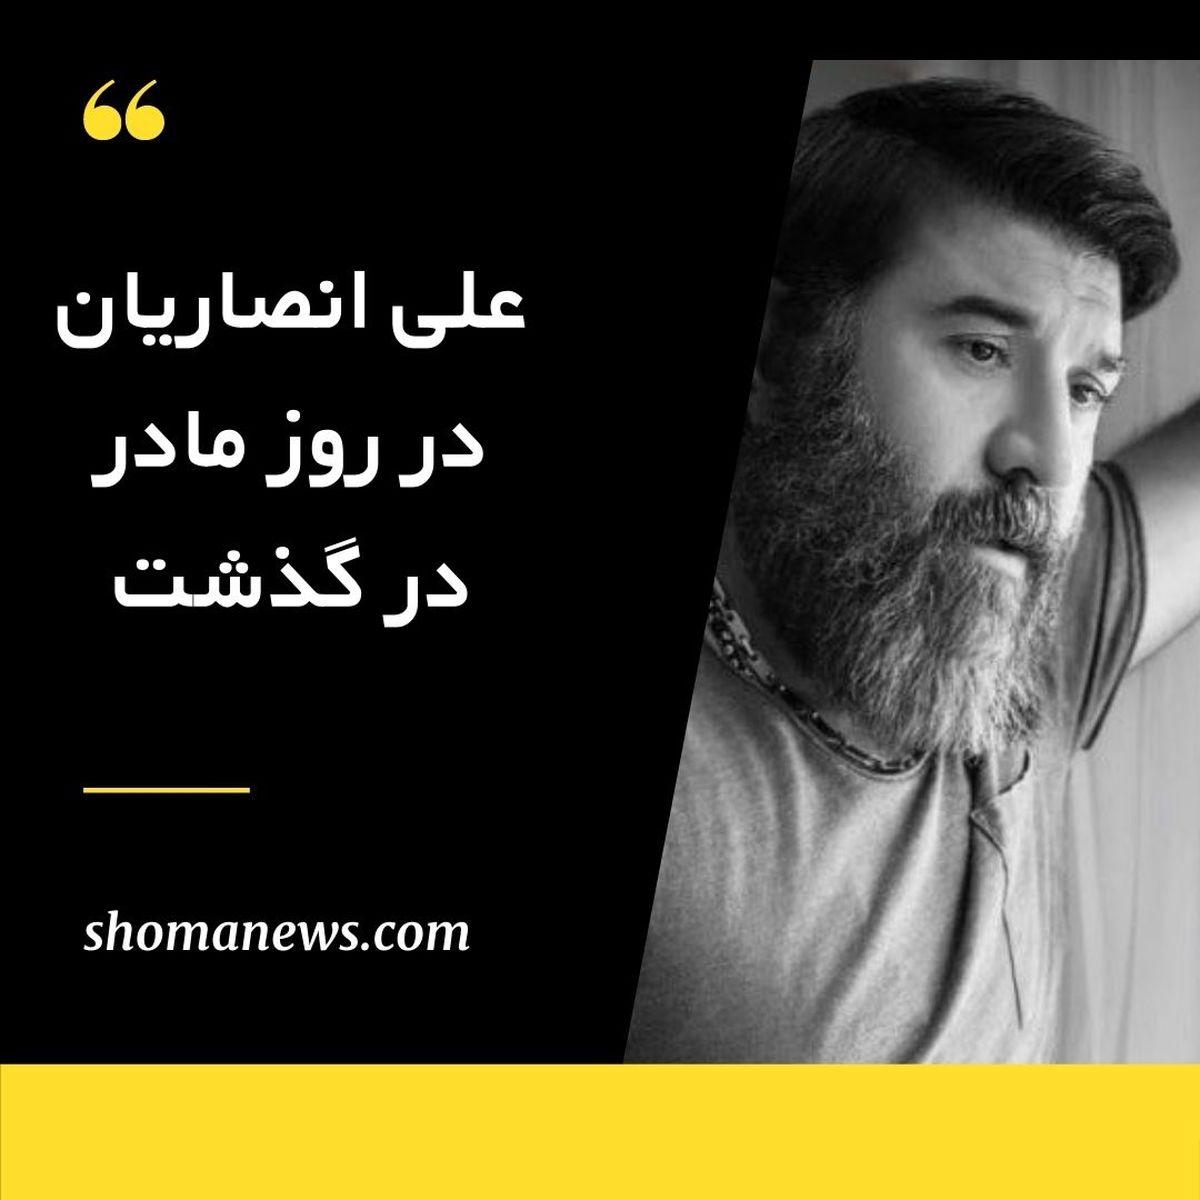 آرزوی علی انصاریان برآورده شد + فیلم